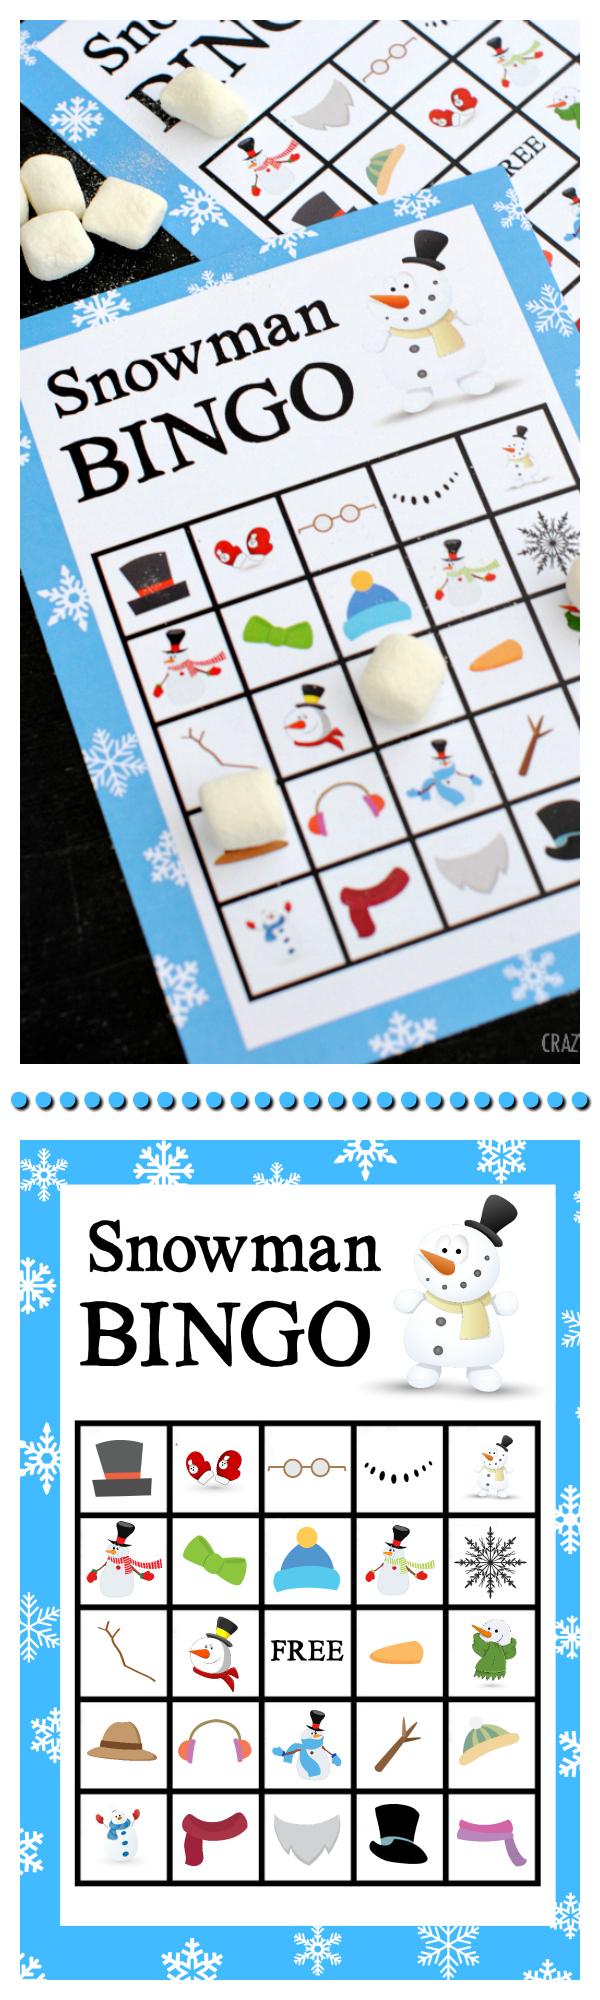 Printable Snowman Bingo Game - Crazy Little Projects